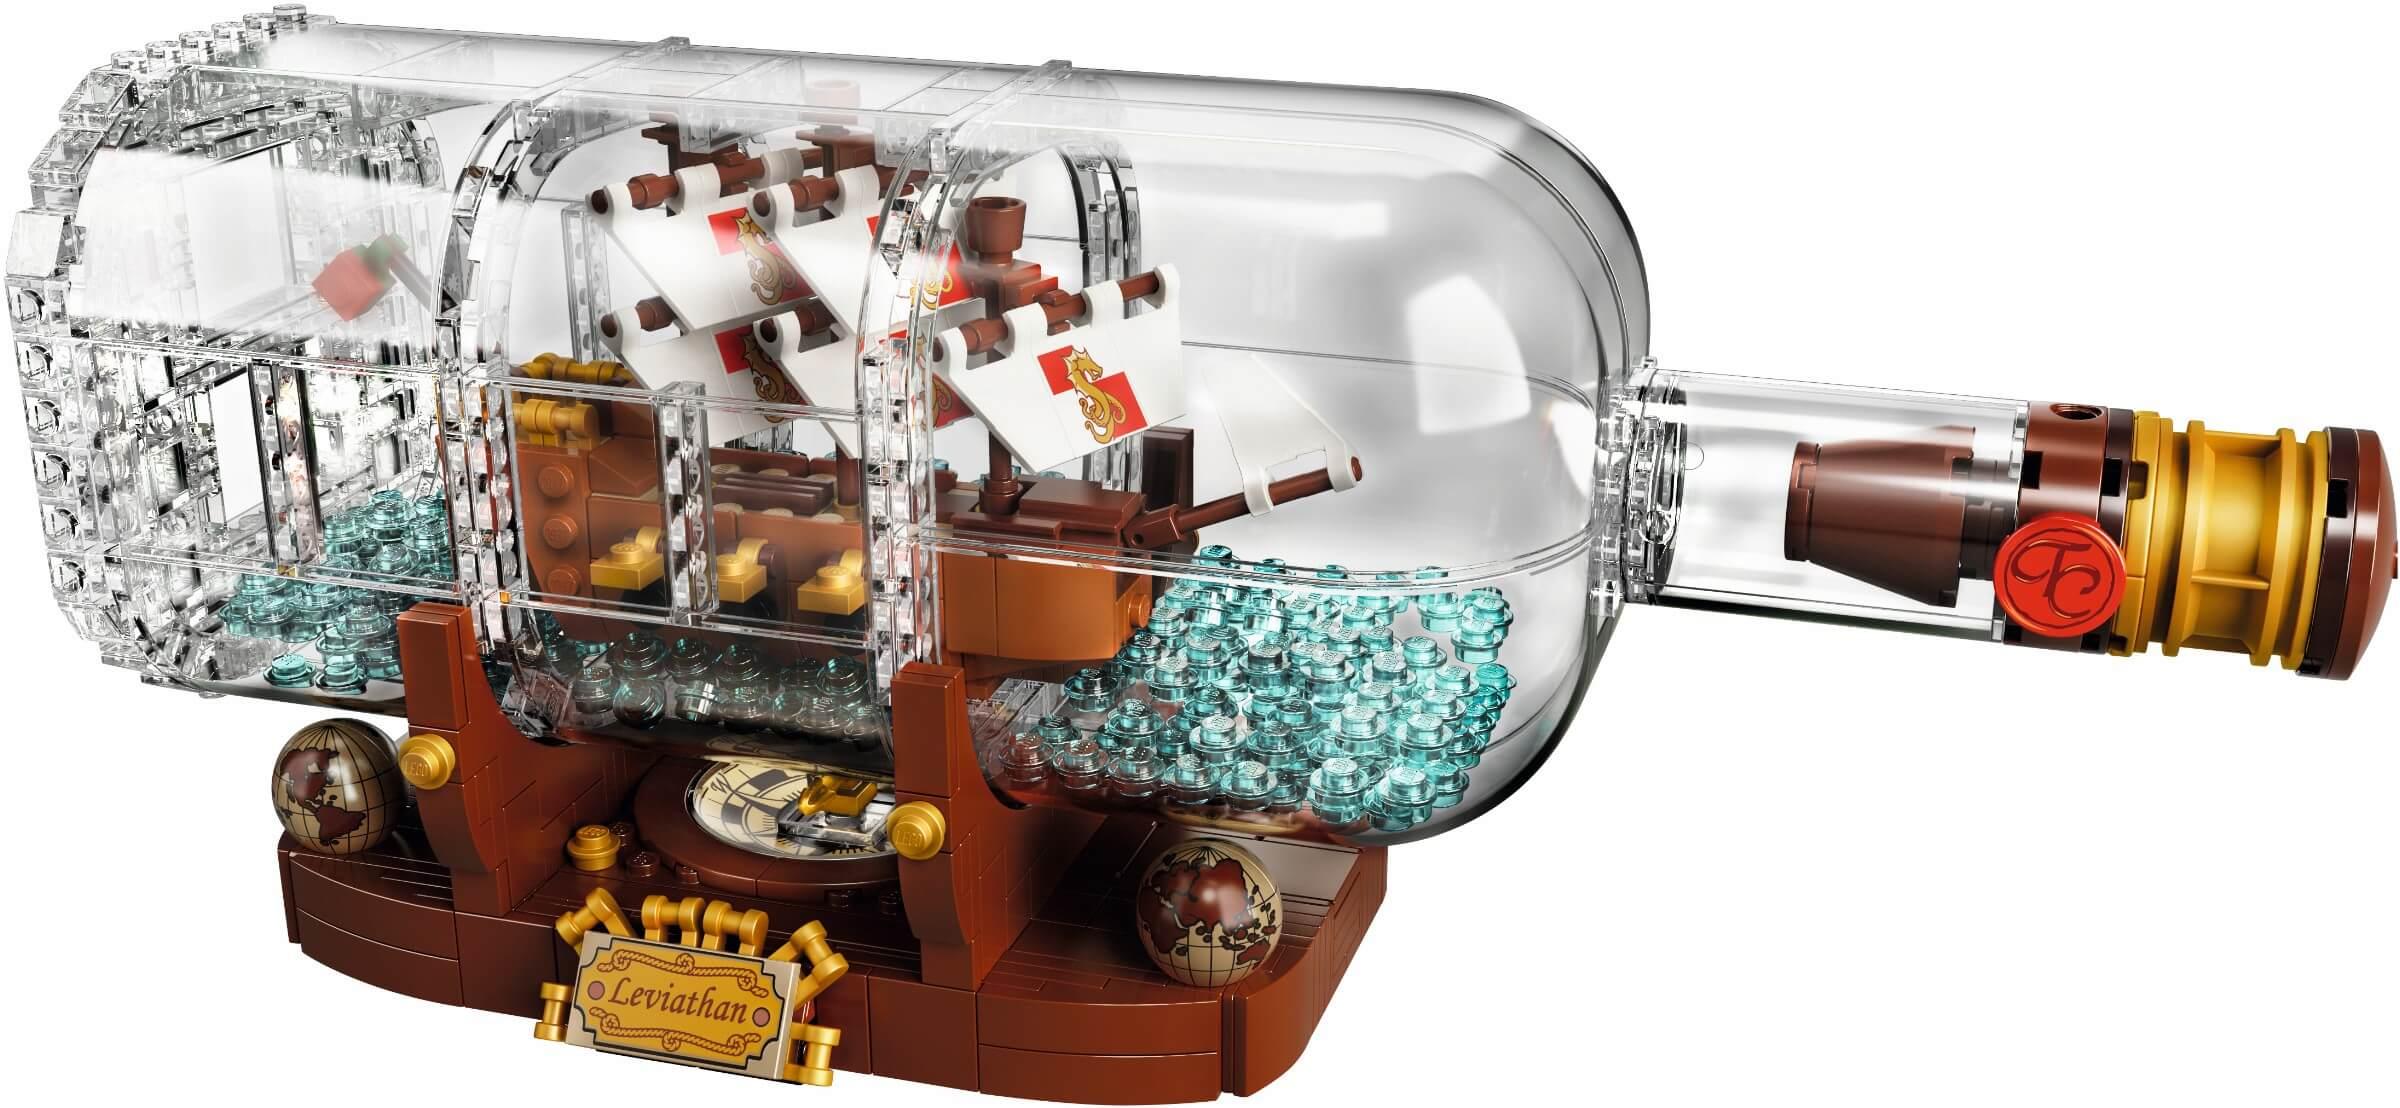 Mua đồ chơi LEGO 21313 - LEGO Ideas 21313 - Mô Hình Thuyền trong Chai Thủy Tinh (LEGO Ideas 21313 Ship in a Bottle)